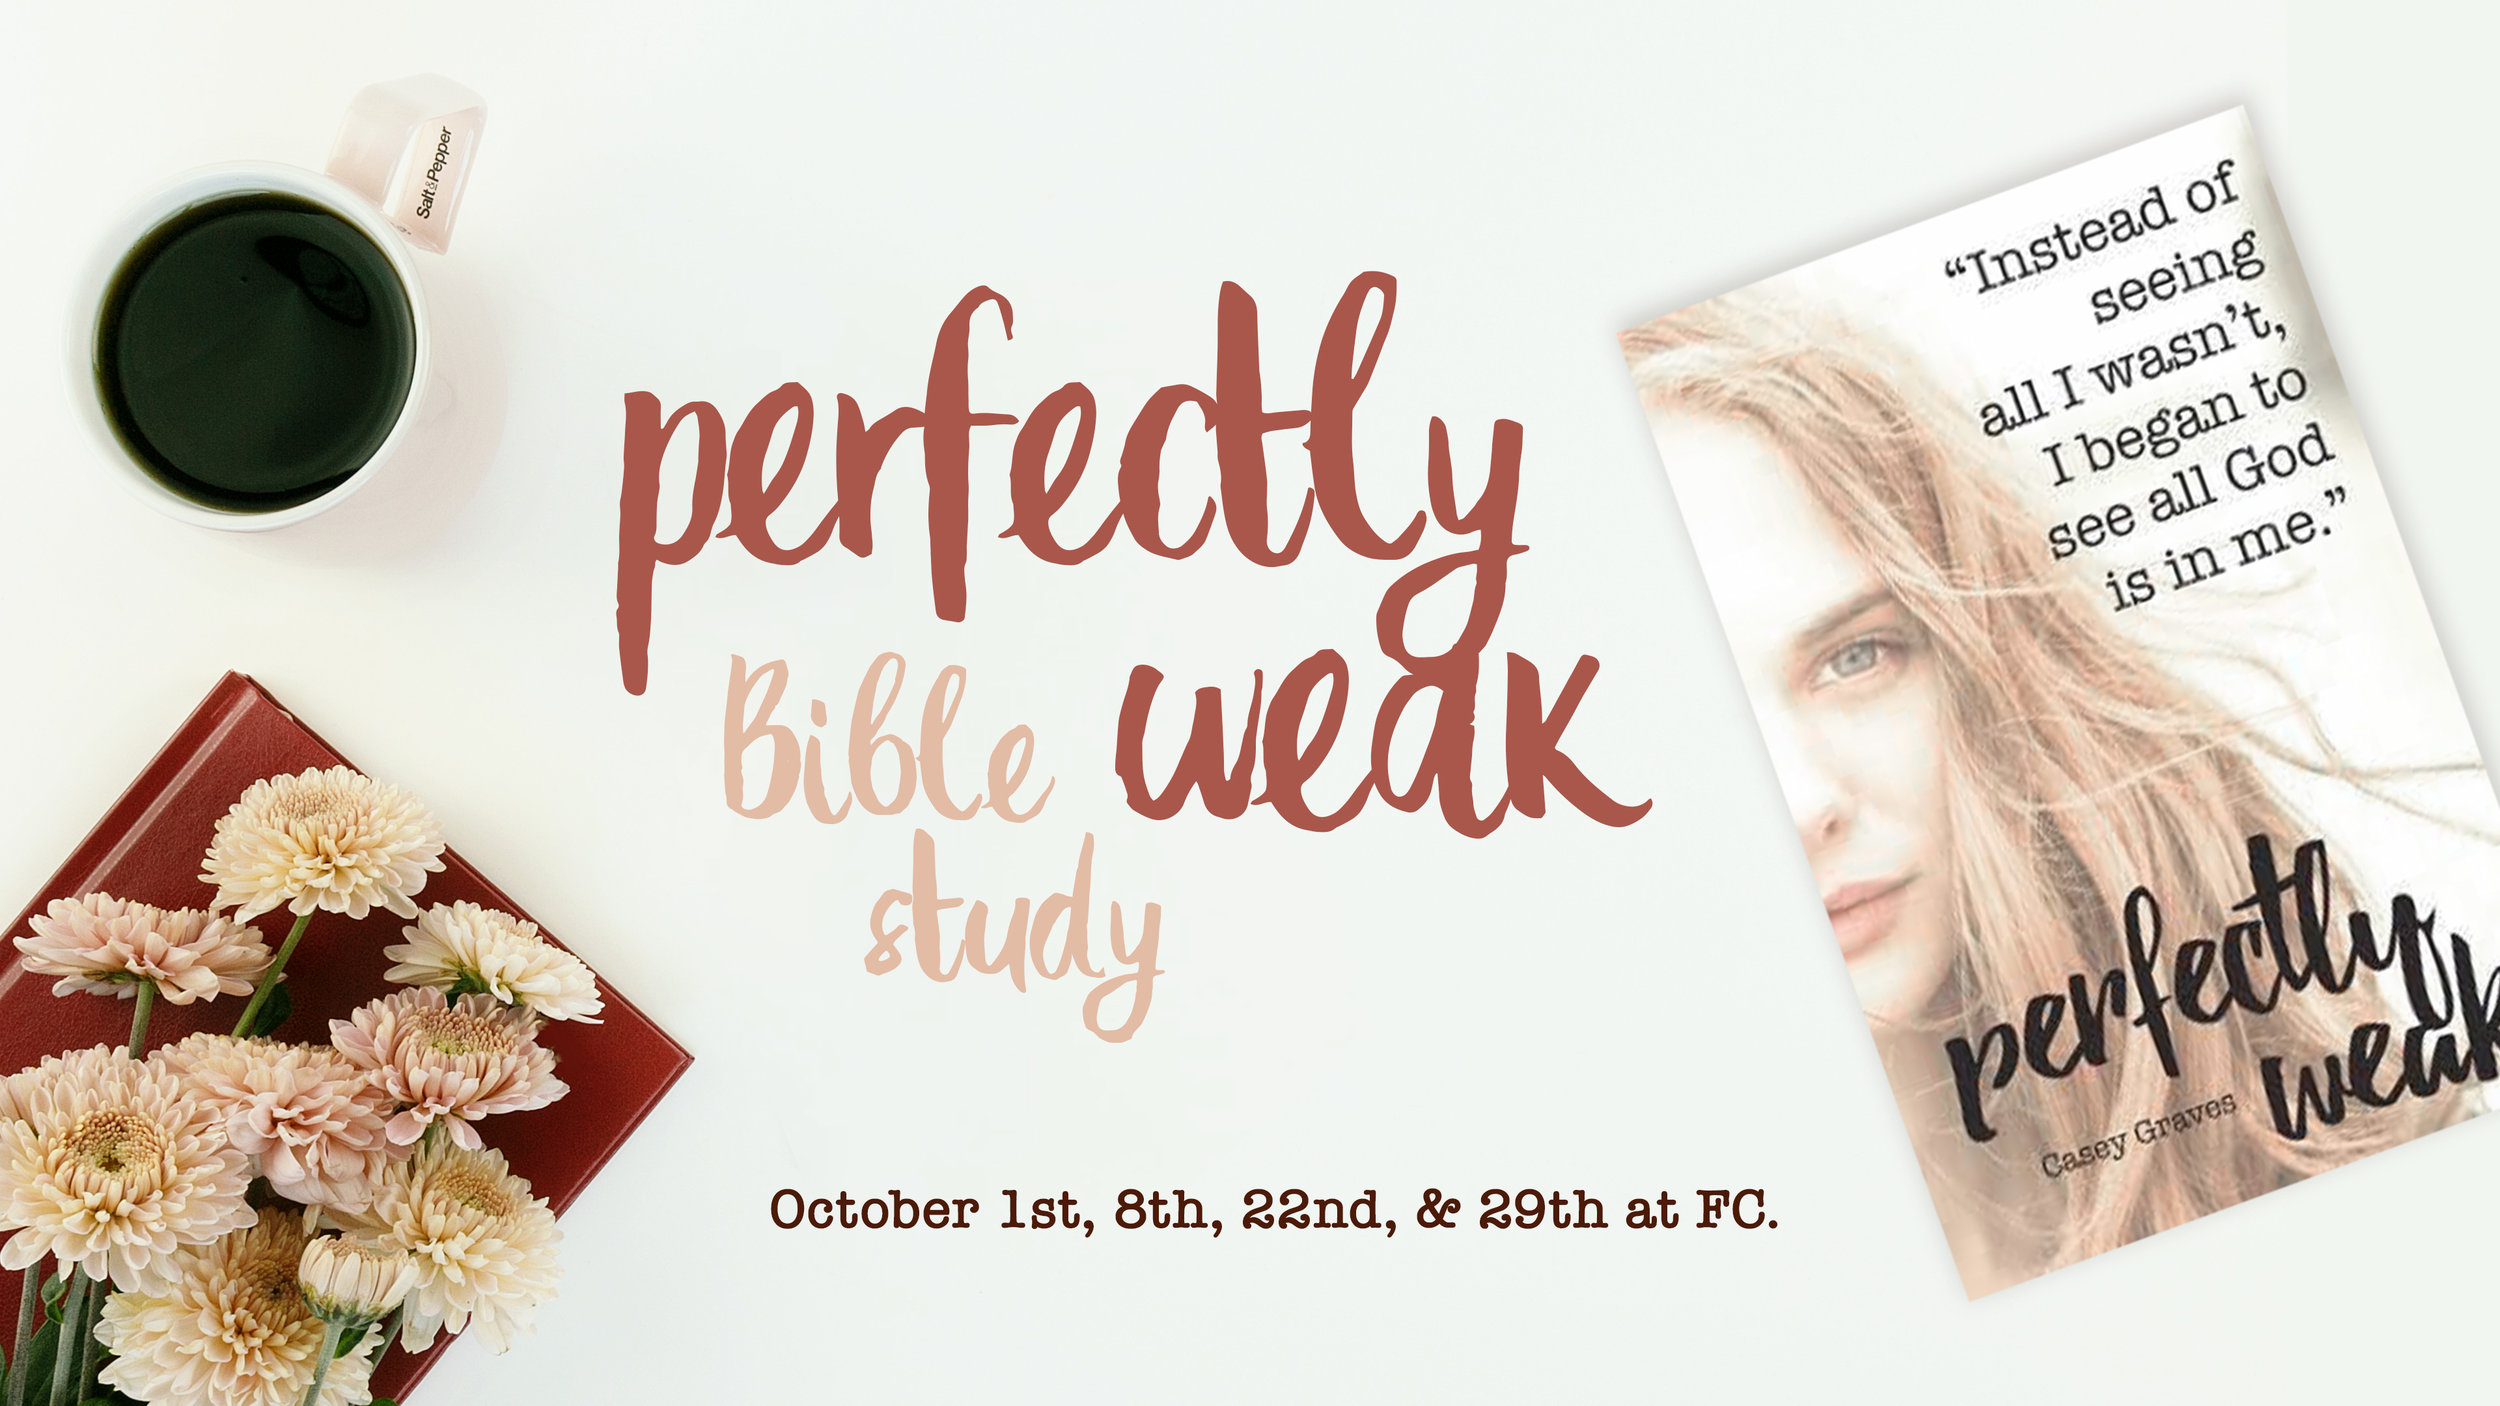 Perfectly Weak Bible Study.jpg